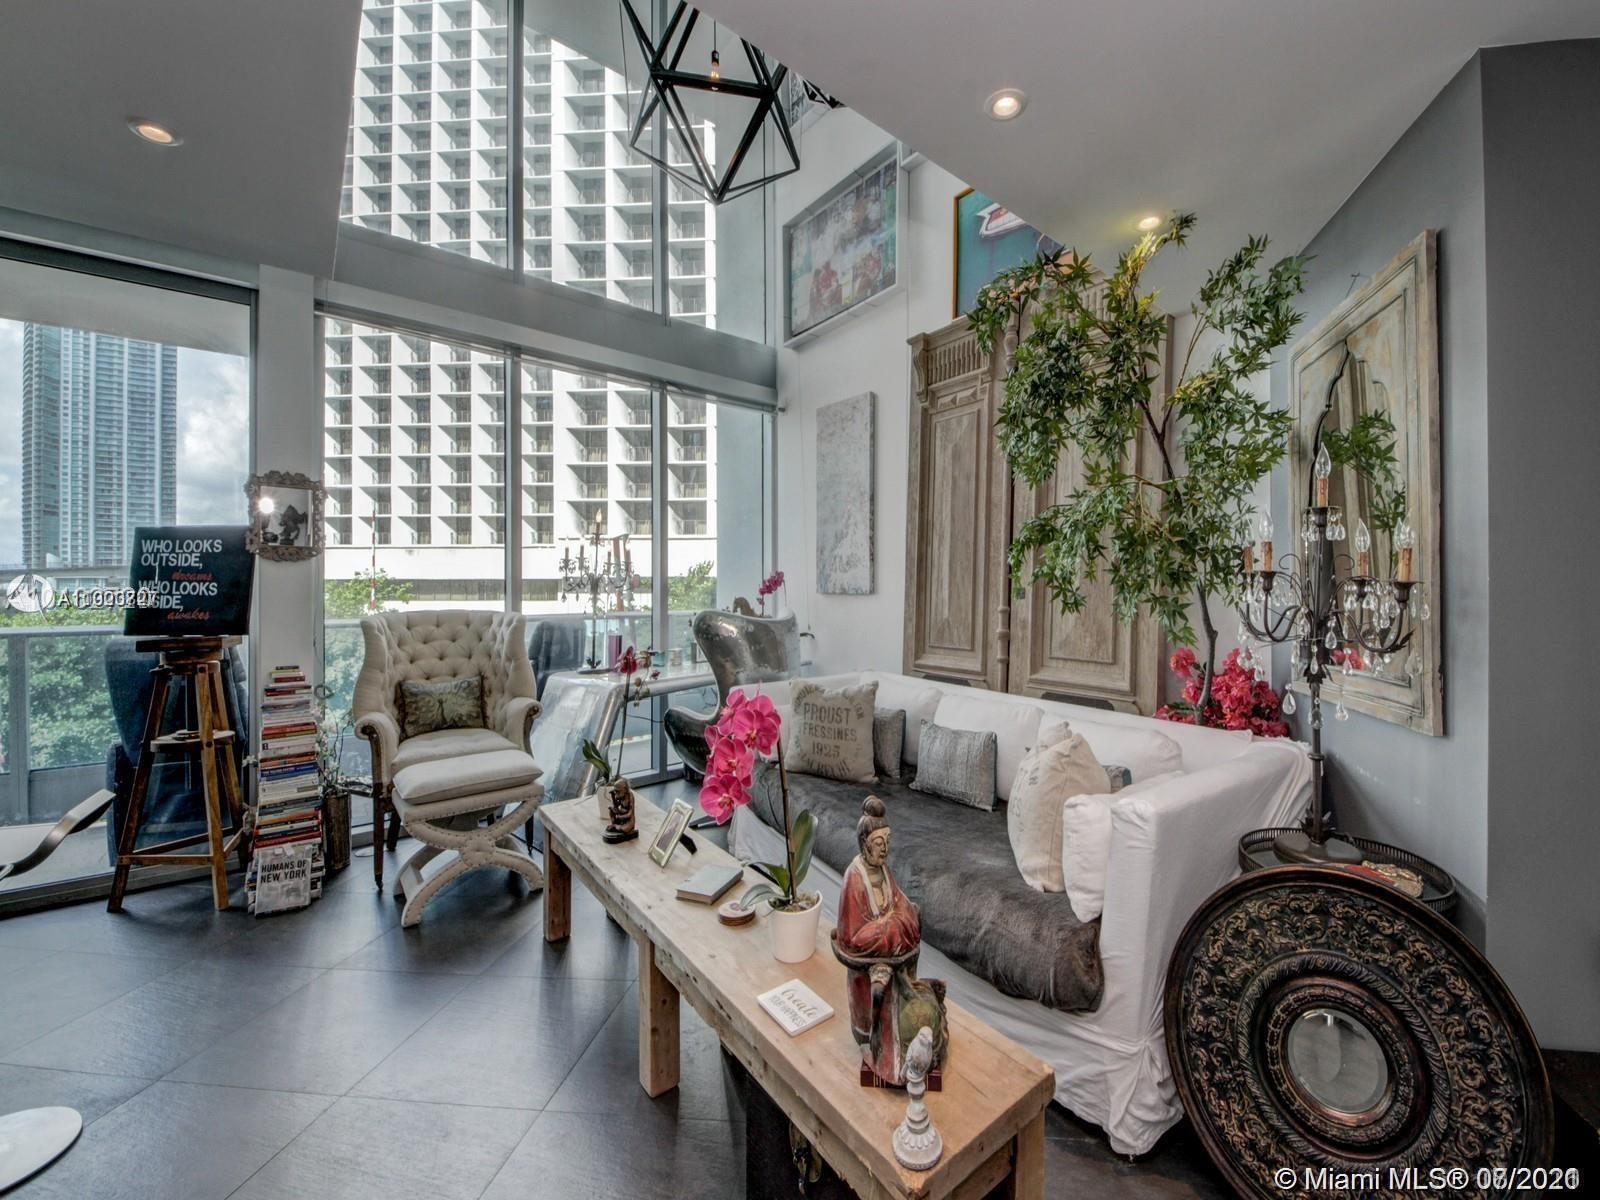 Downtown Miami's most prestigious address Beautiful, artistically decorated 2 story loft Floor to ce